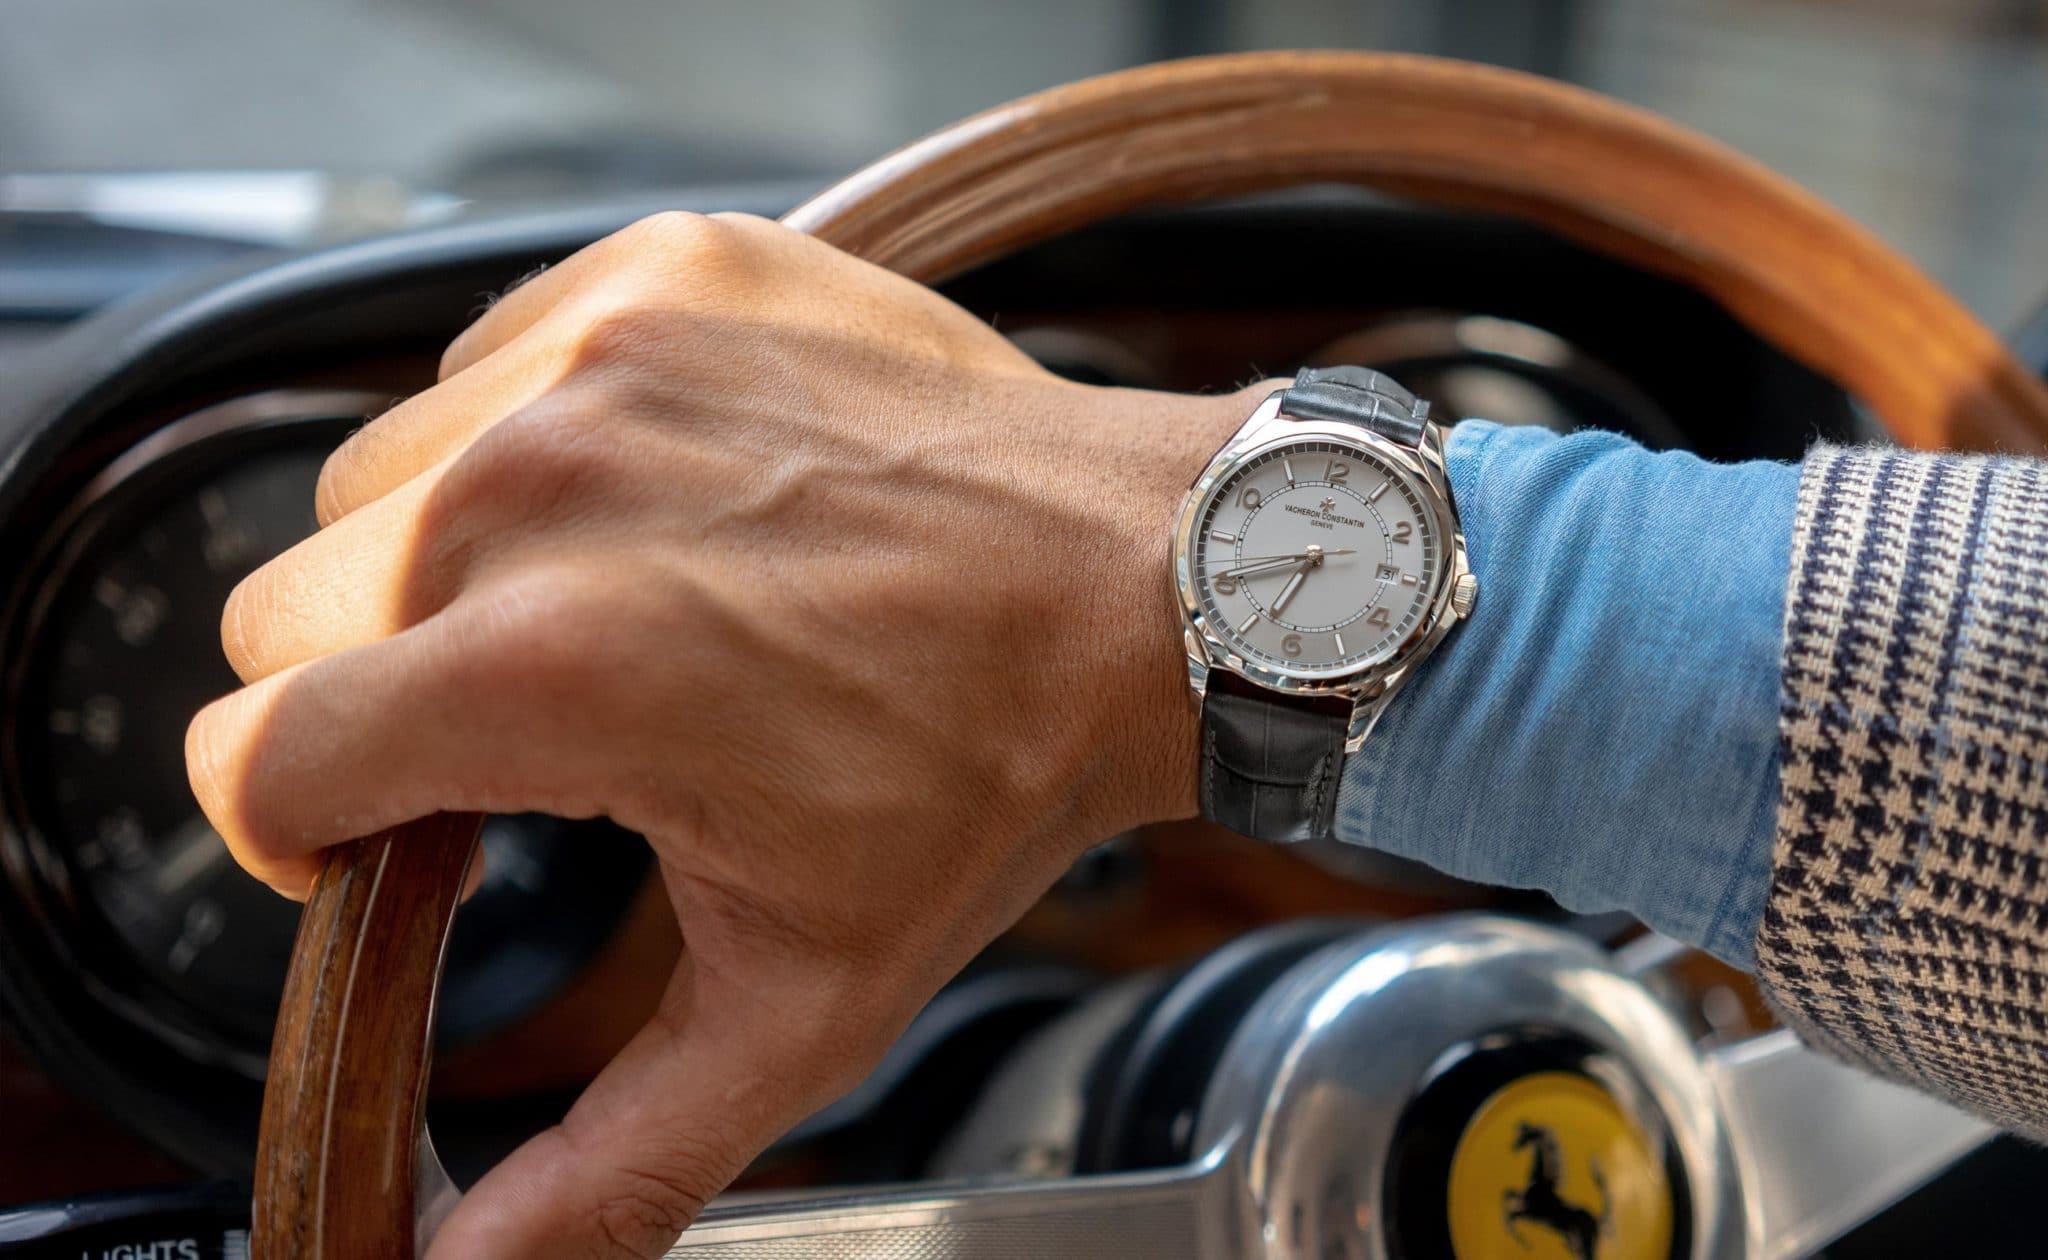 luxury brand influencer marketing - watch and ferrari